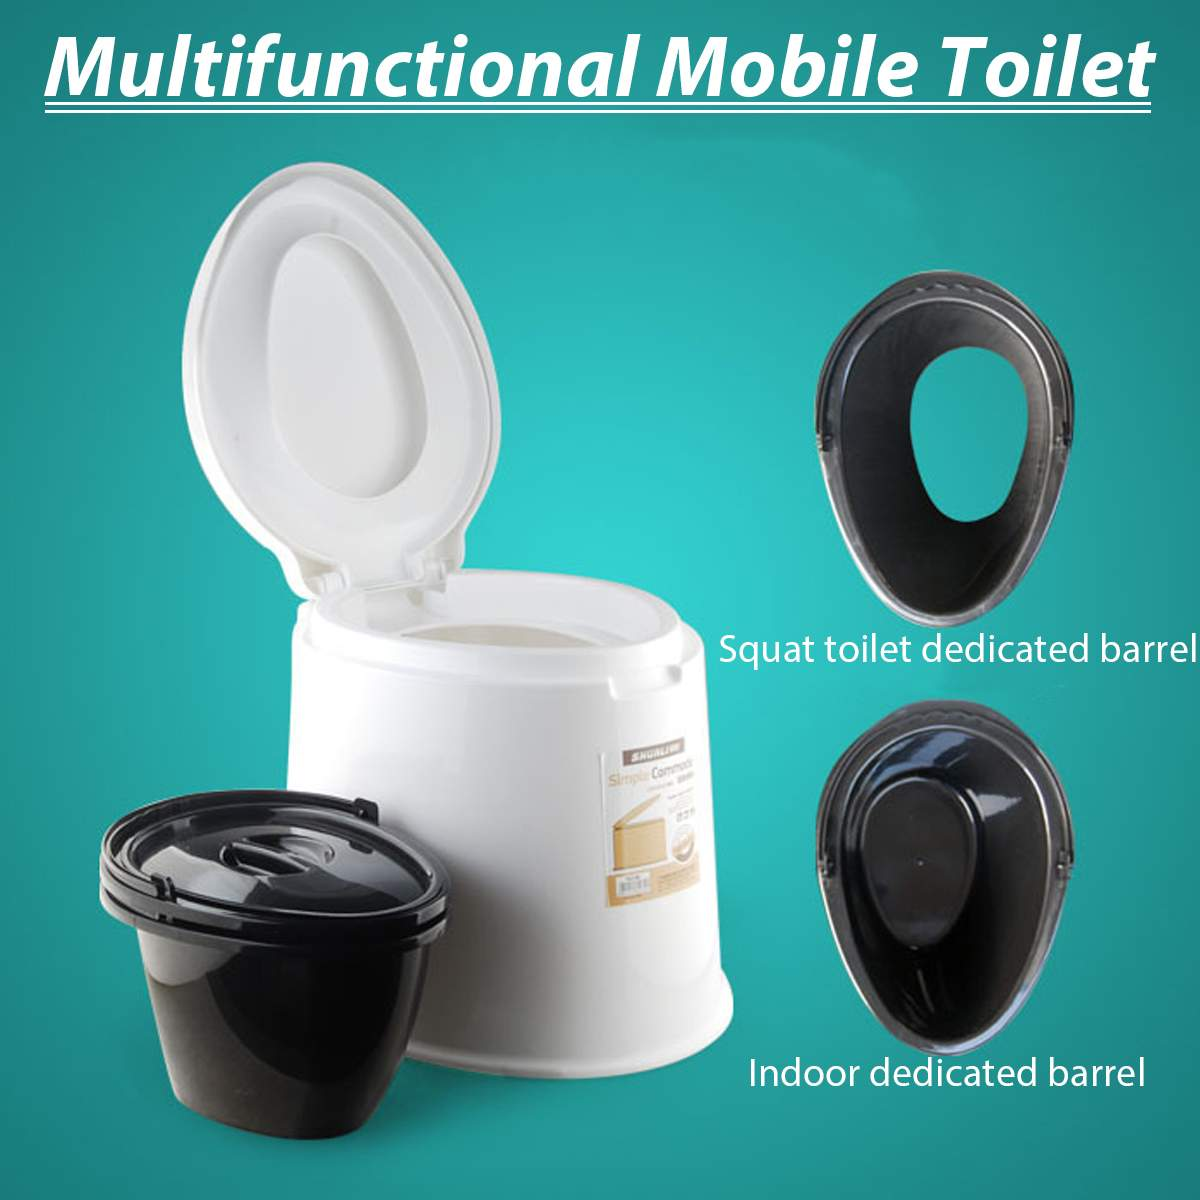 6l Tragbare Toilette Camp Wc Camping Outdoor-tool Double Barrel Fabriken Und Minen